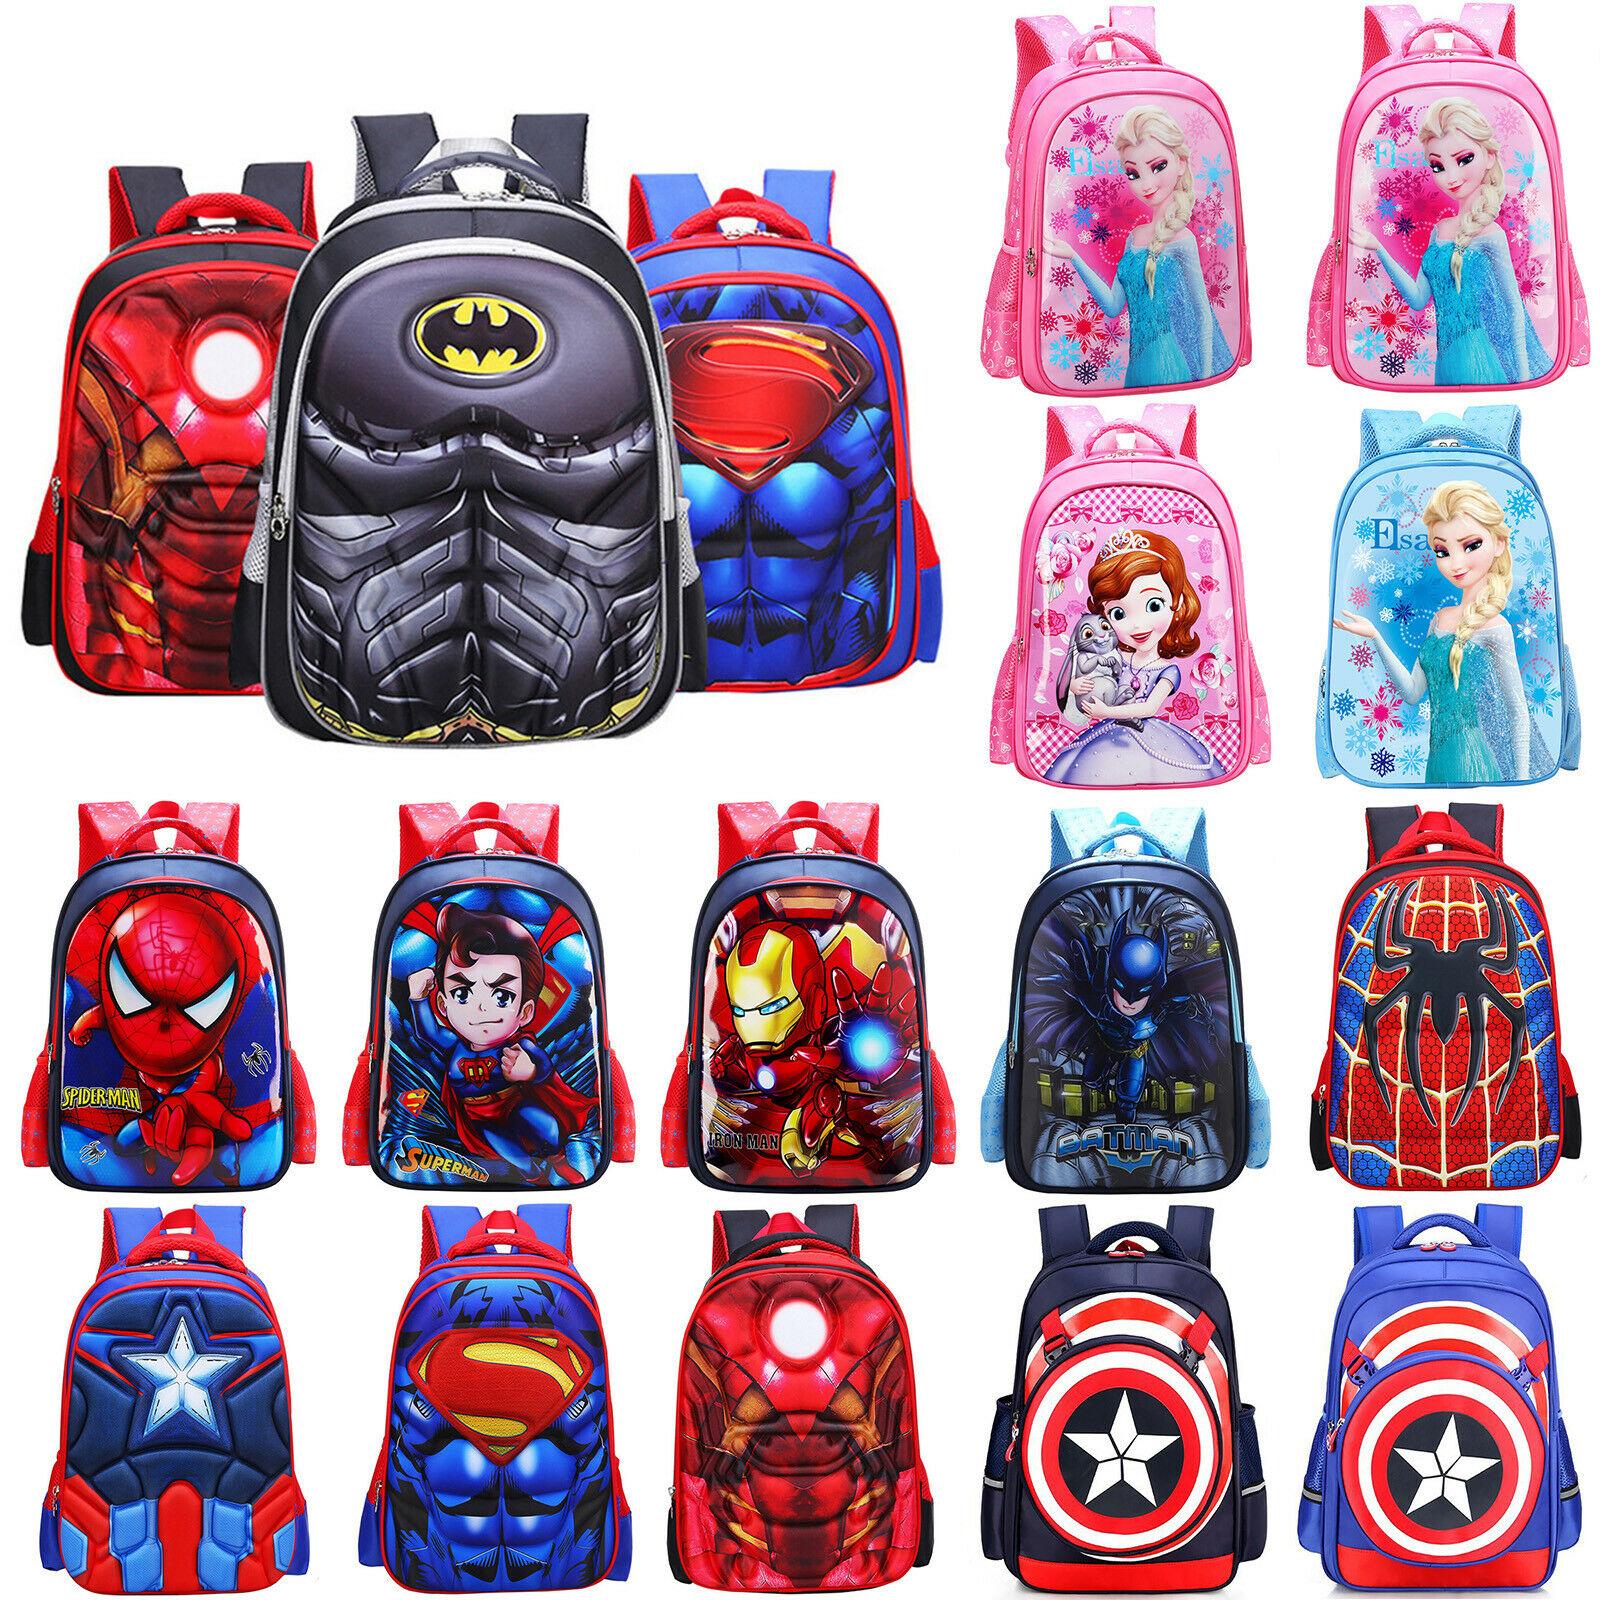 3D Kids School Book Bag Spiderman Backpack Captain America Batman For Boys Child